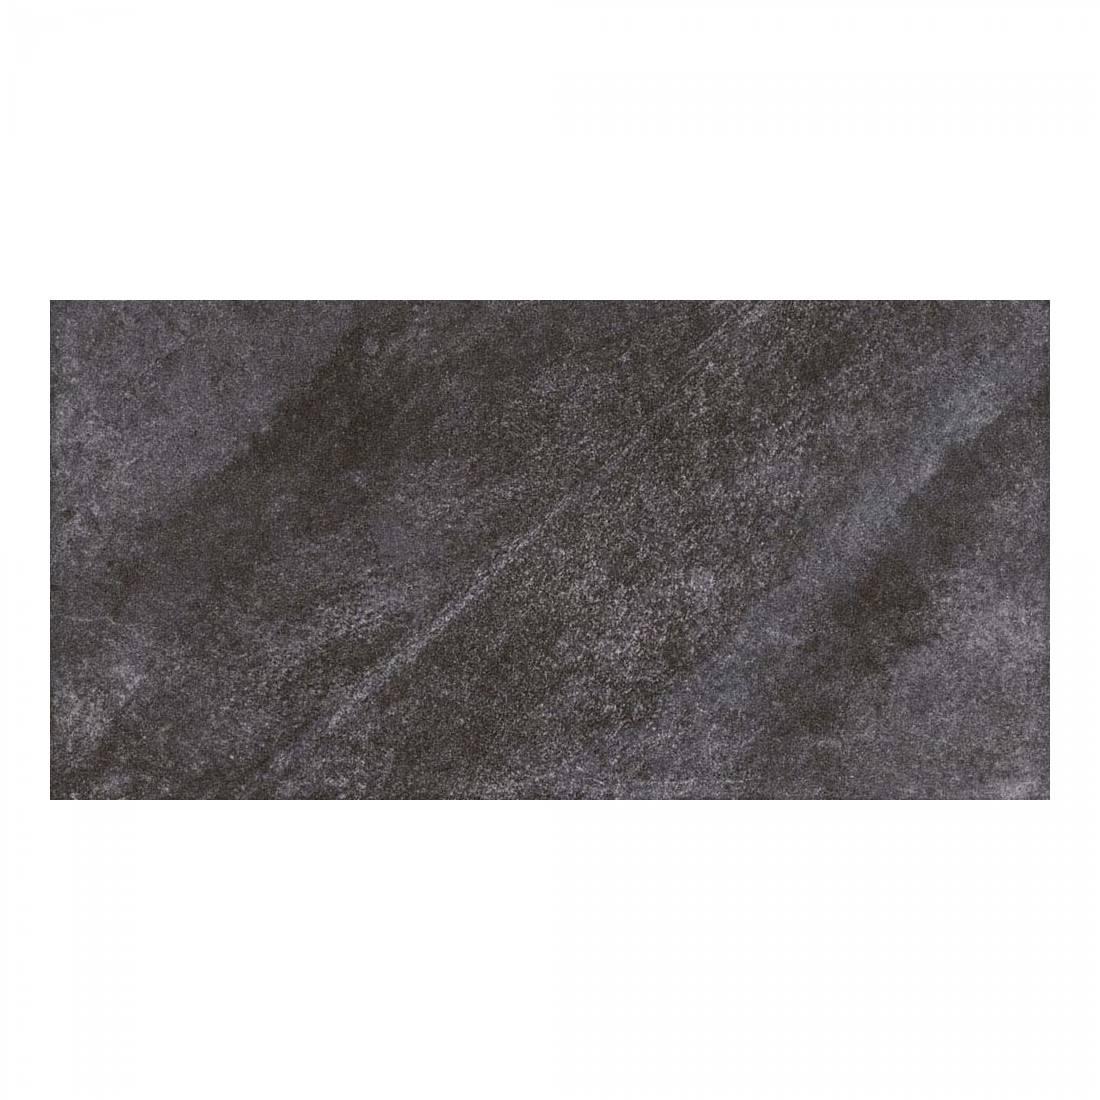 Buxy 30x60 Anthracite Matt R10 1